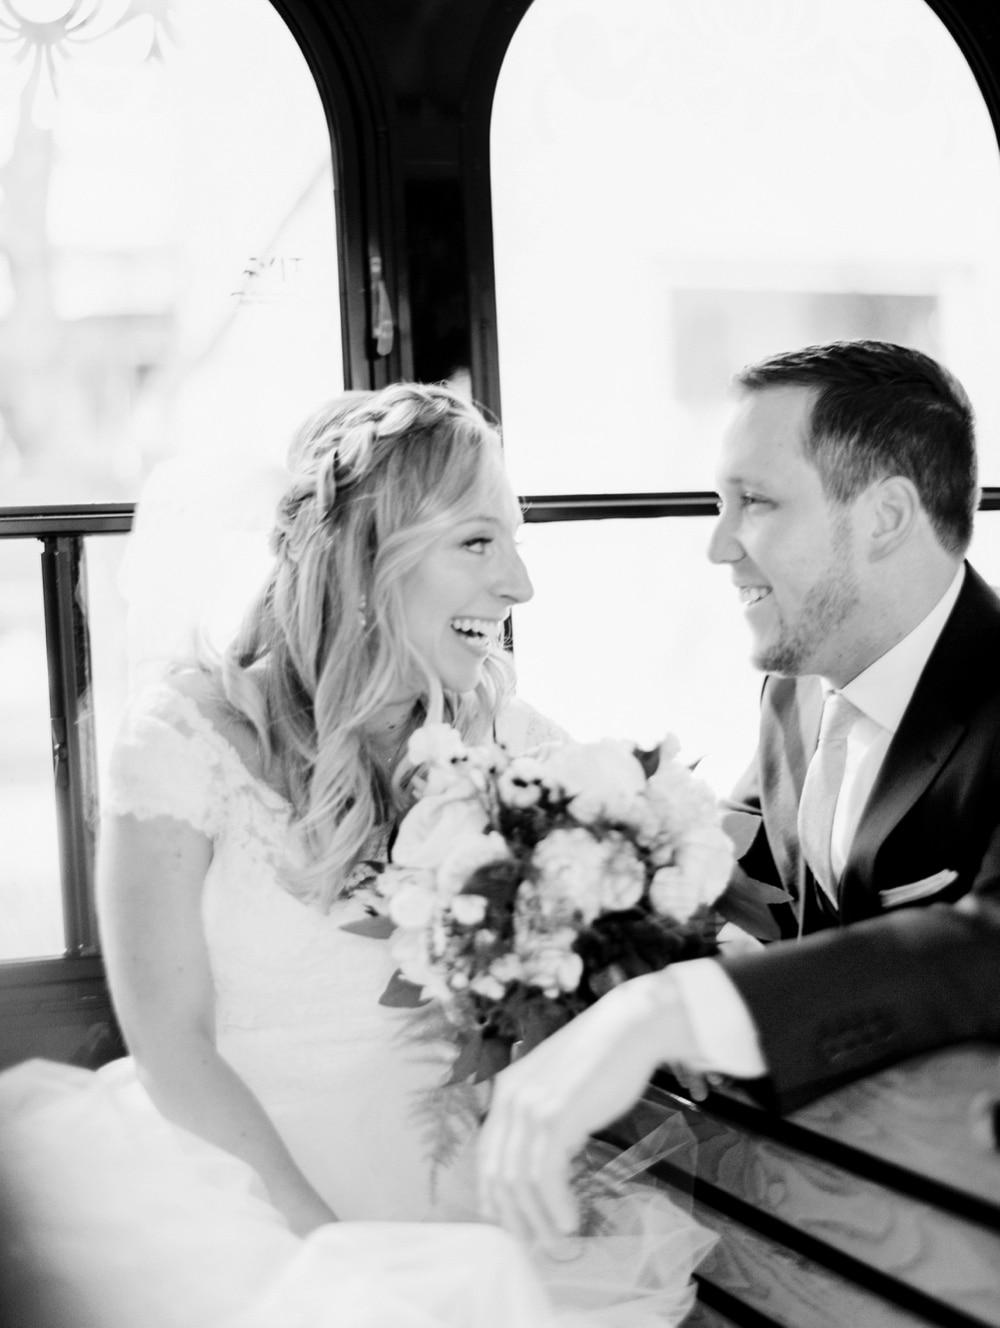 kristin-la-voie-photography-Cafe-Brauer-Chicago-Wedding-Photographer-98